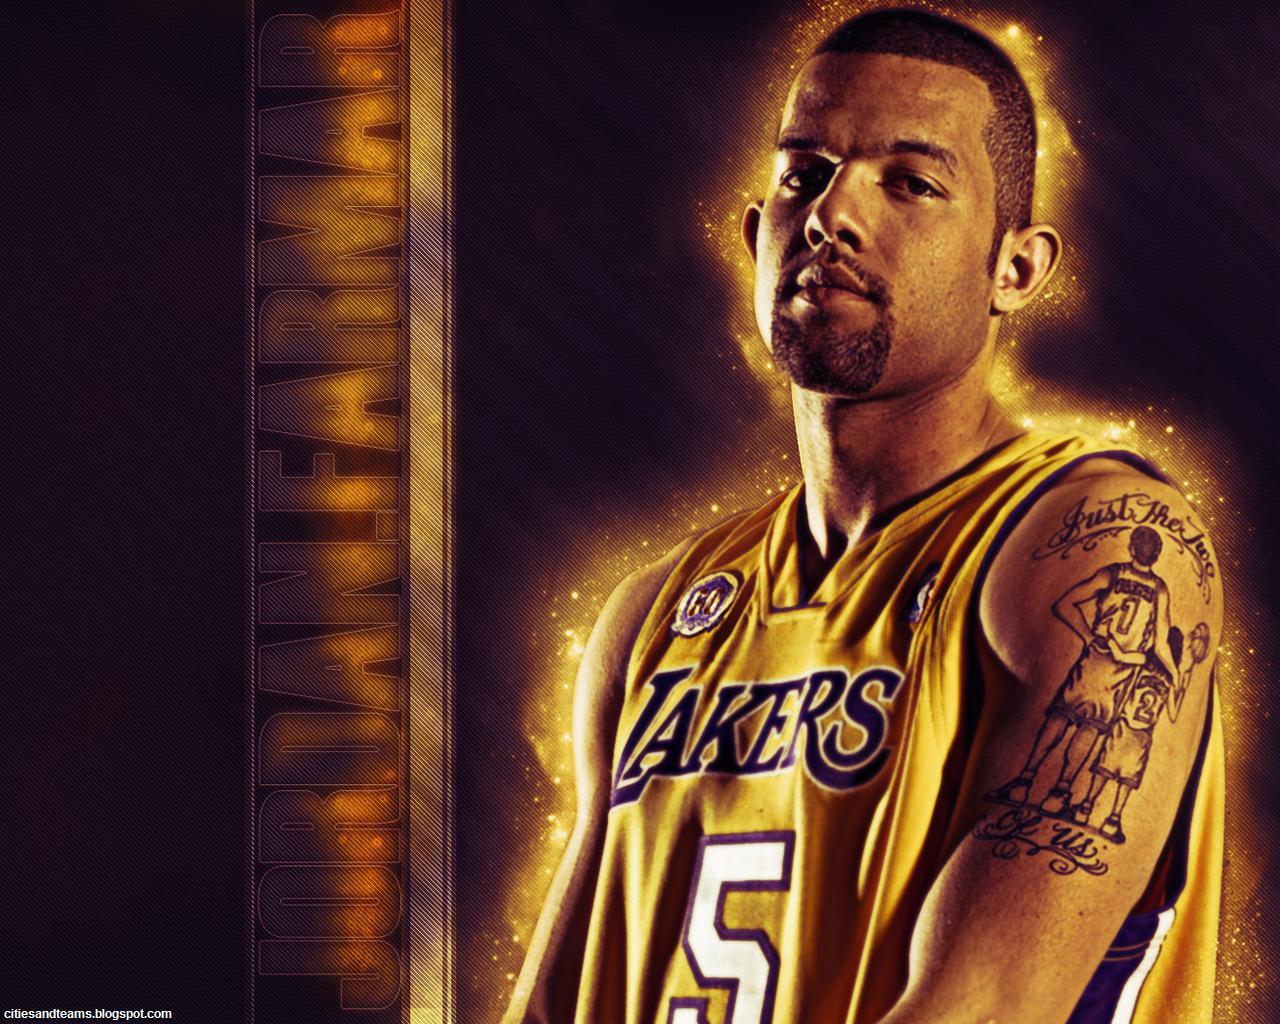 http://4.bp.blogspot.com/-2SnPgleBLxc/UEzMYIRcLQI/AAAAAAAAHtY/cDL7kxJwinA/s1600/Jordan_Farmar_Anadolu_Efes_Basketball_Player_American_Point_Guard_USA_Nba_Hd_Desktop_Wallpaper_citiesandteams.blogspot.com.jpg